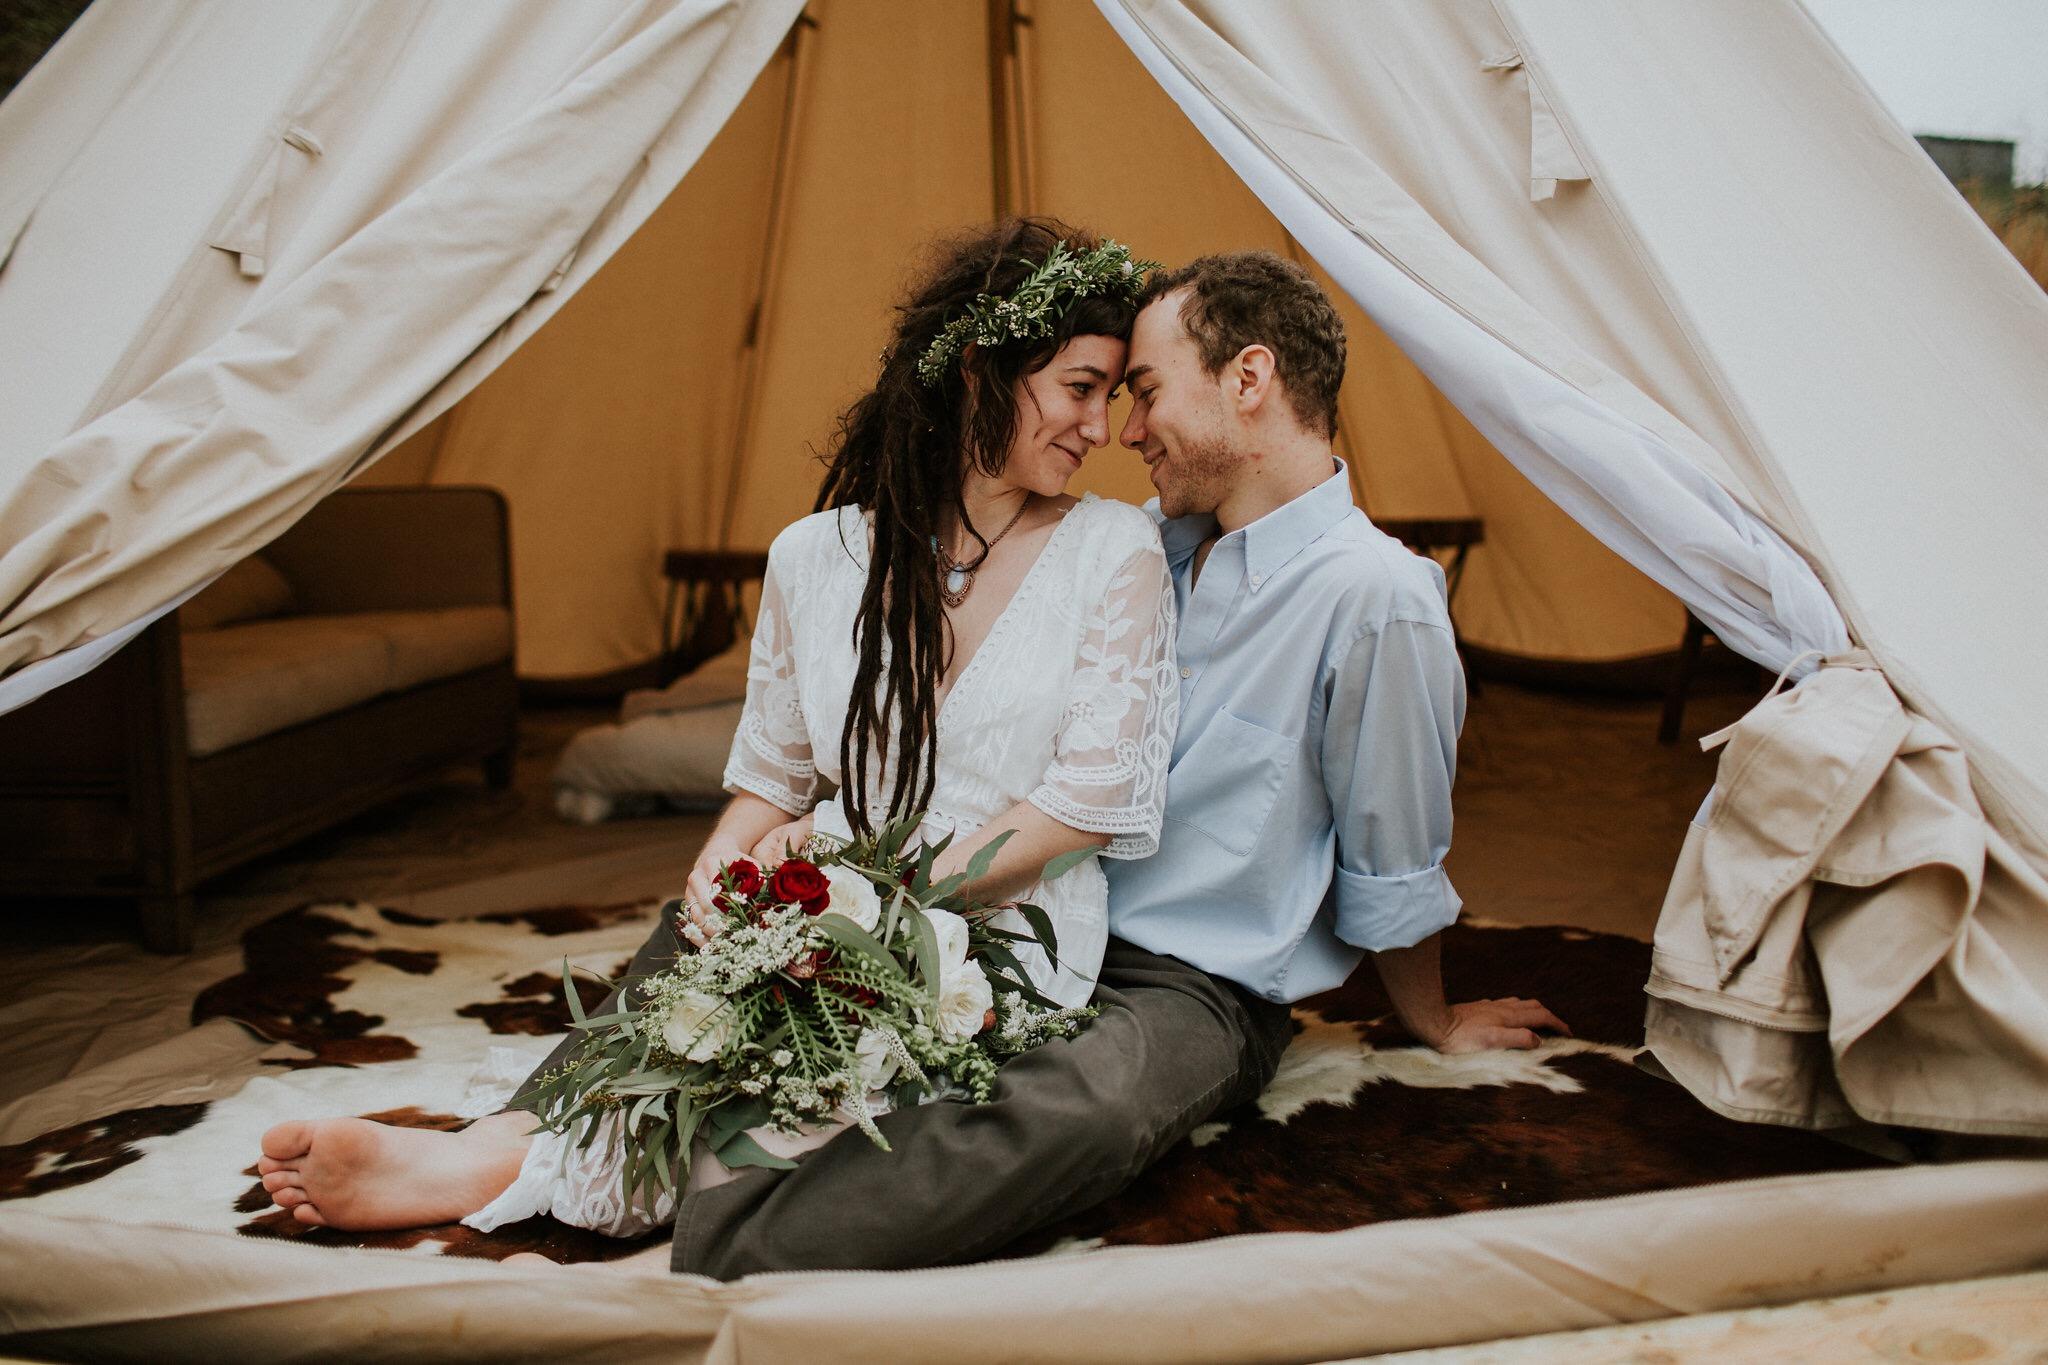 Asheville Glamping- Bell tent